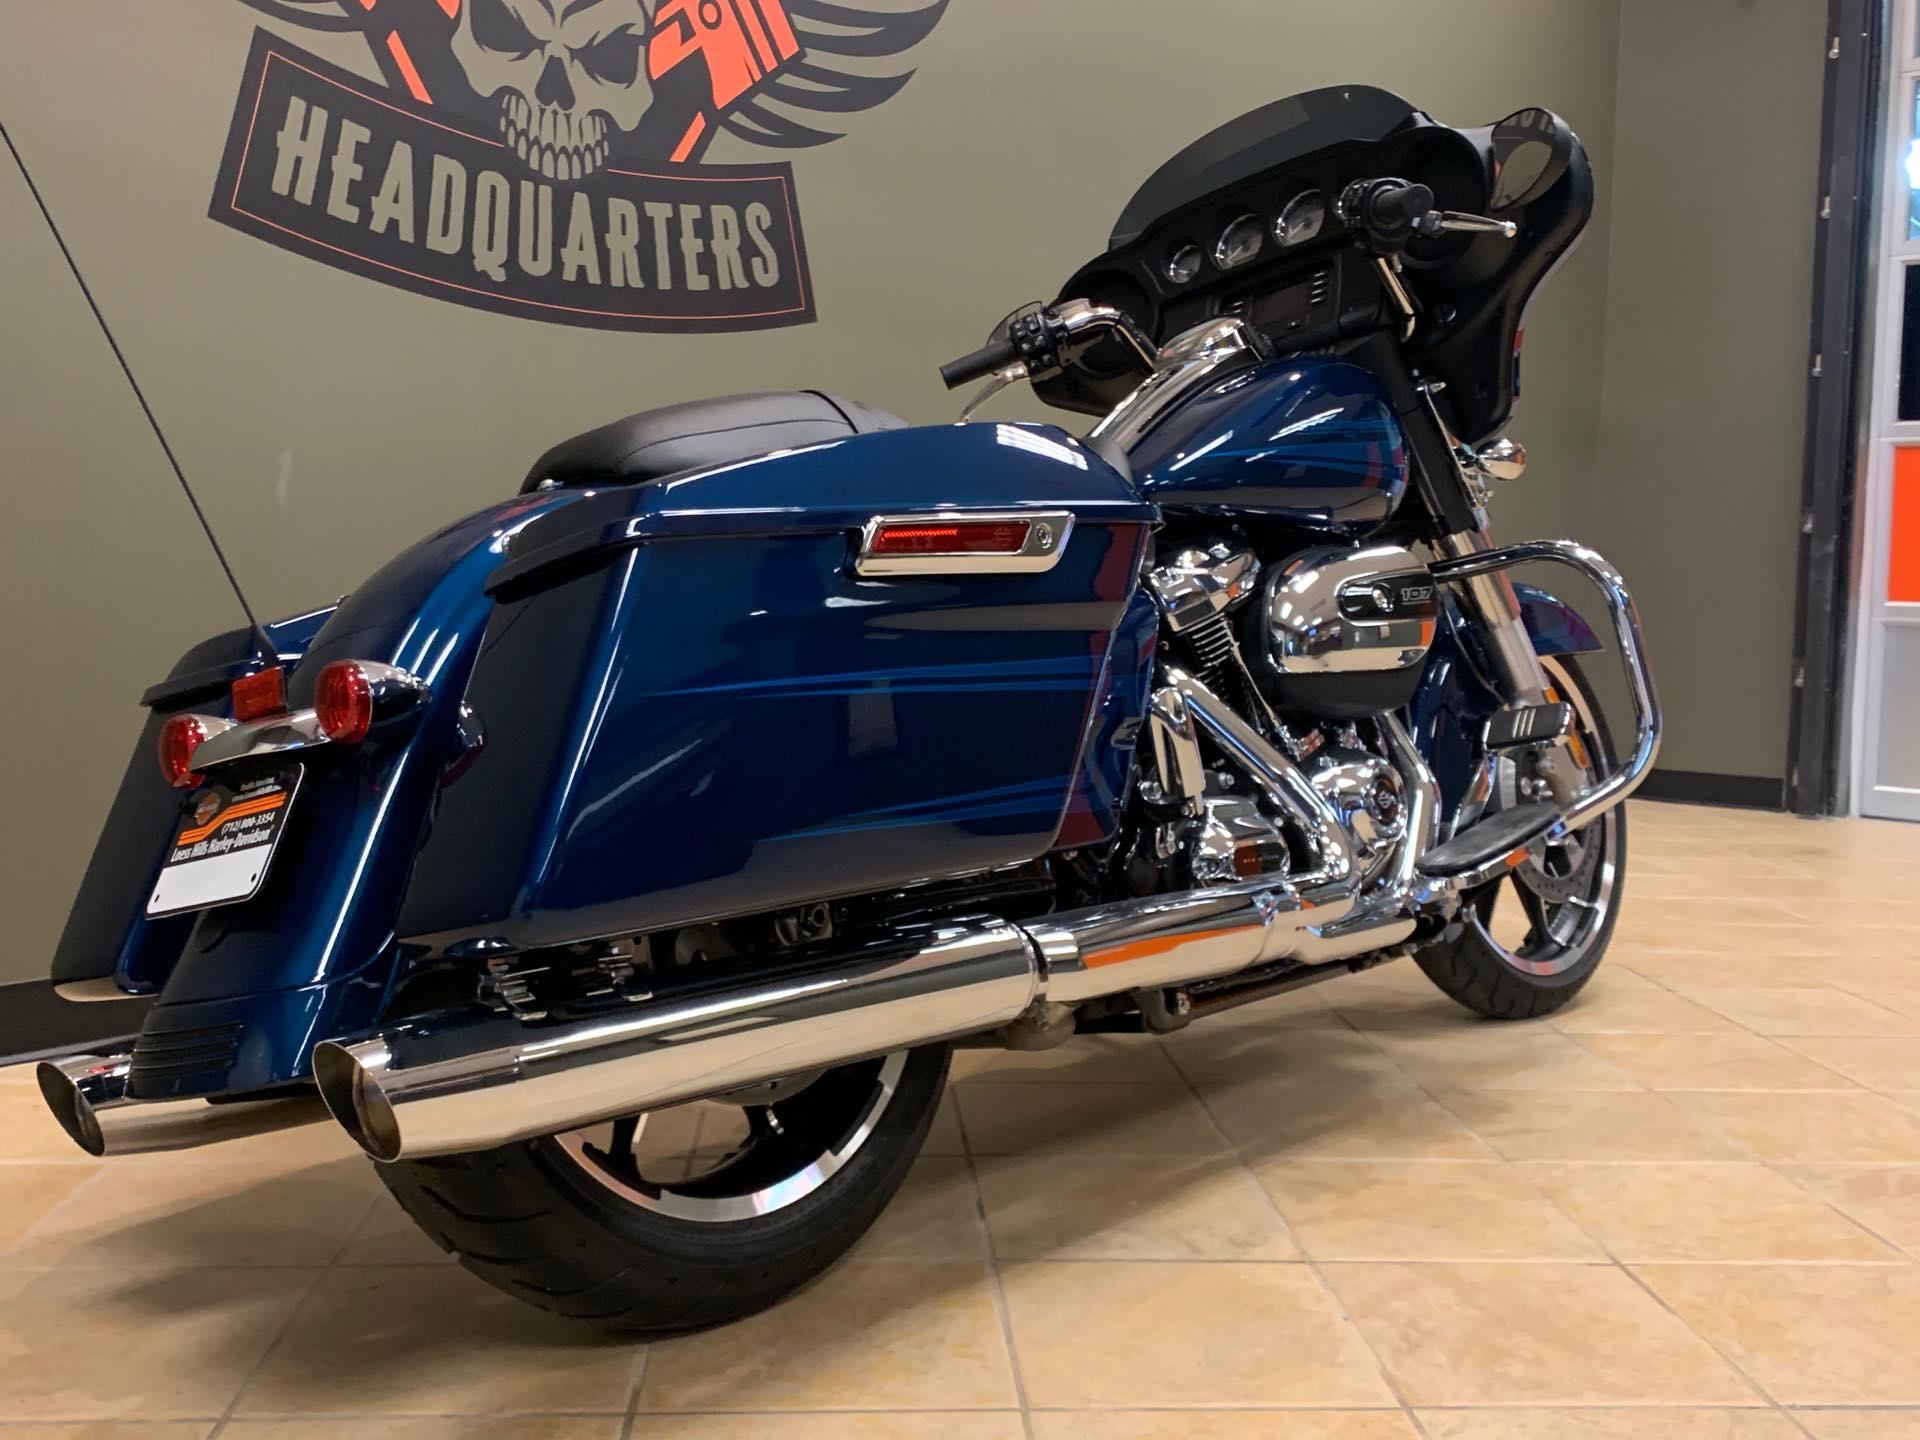 2020 Harley-Davidson Touring Street Glide at Loess Hills Harley-Davidson